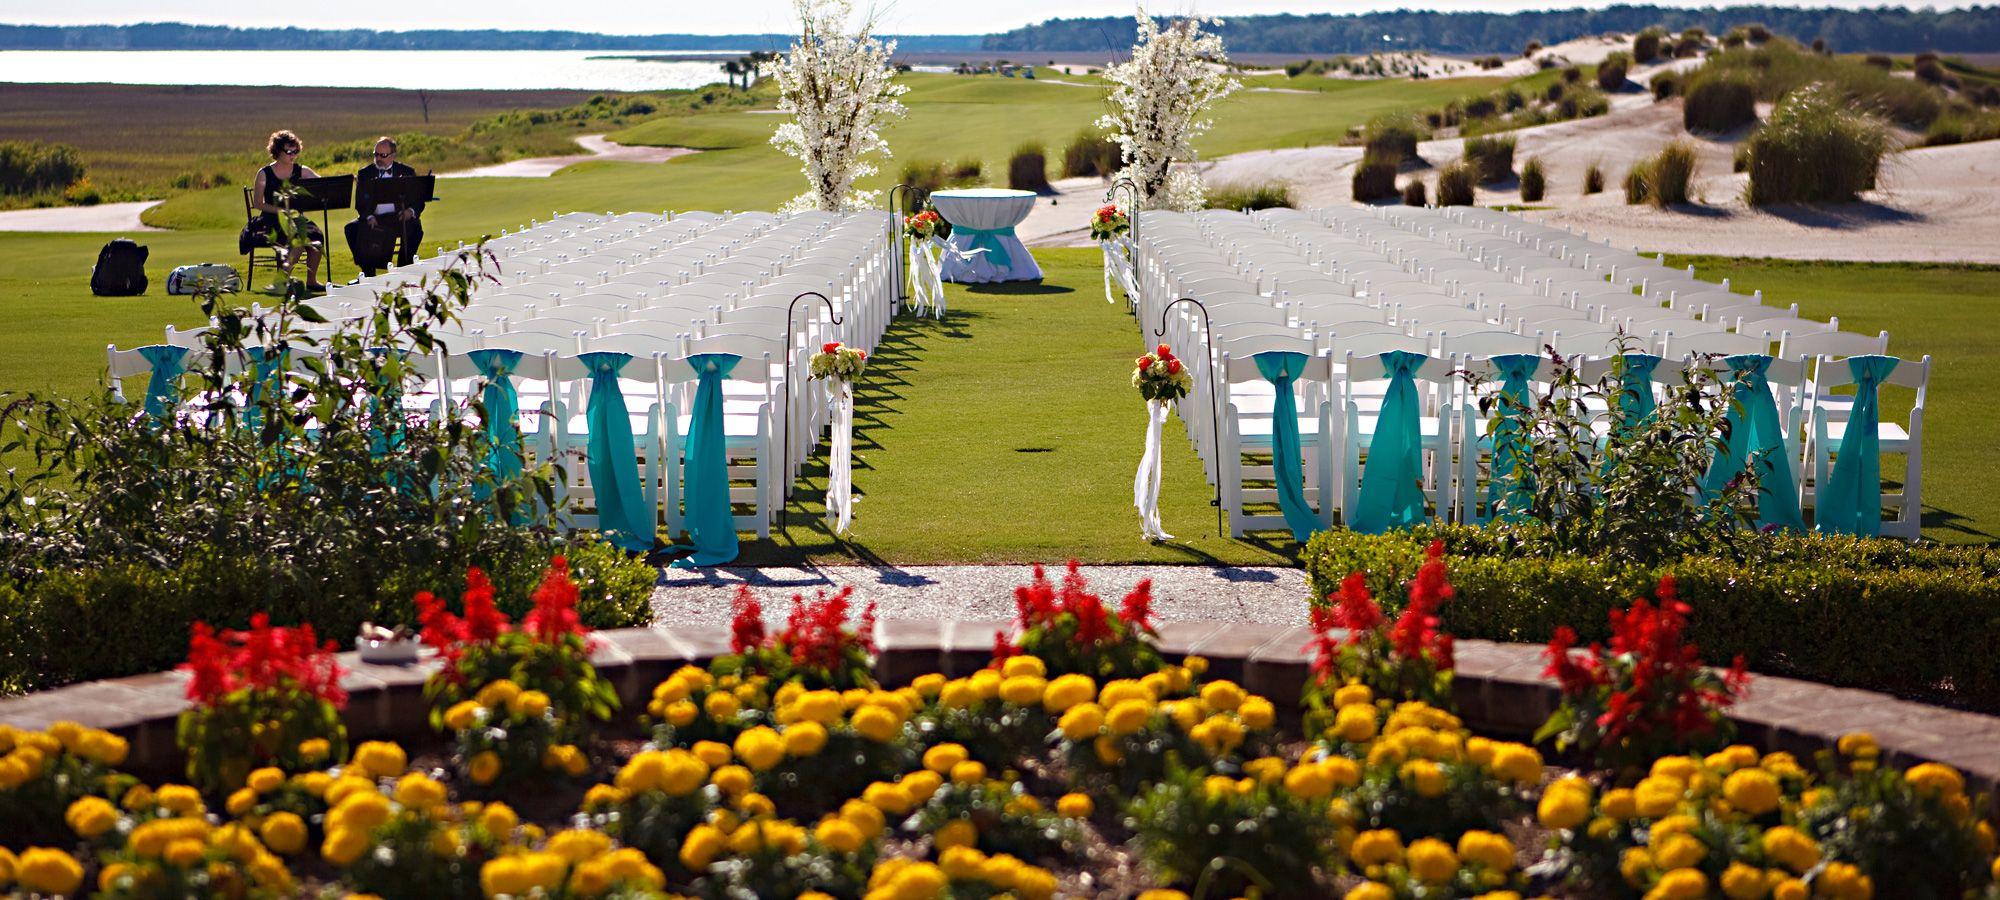 Hilton Head, SC Wedding Venues Colleton River Plantation